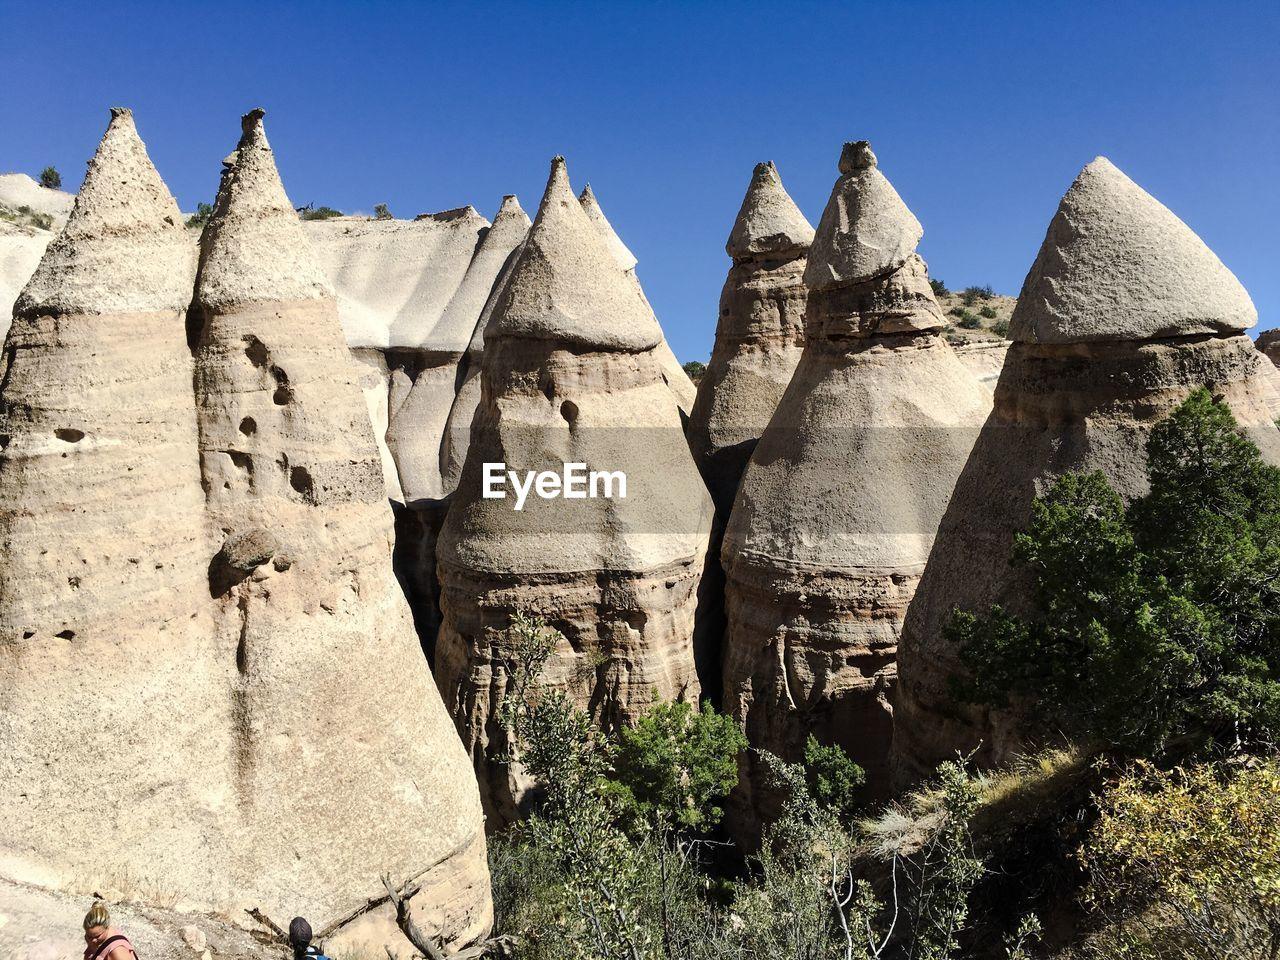 Rock Formations At Kasha-Katuwe Tent Rocks National Monument Against Sky